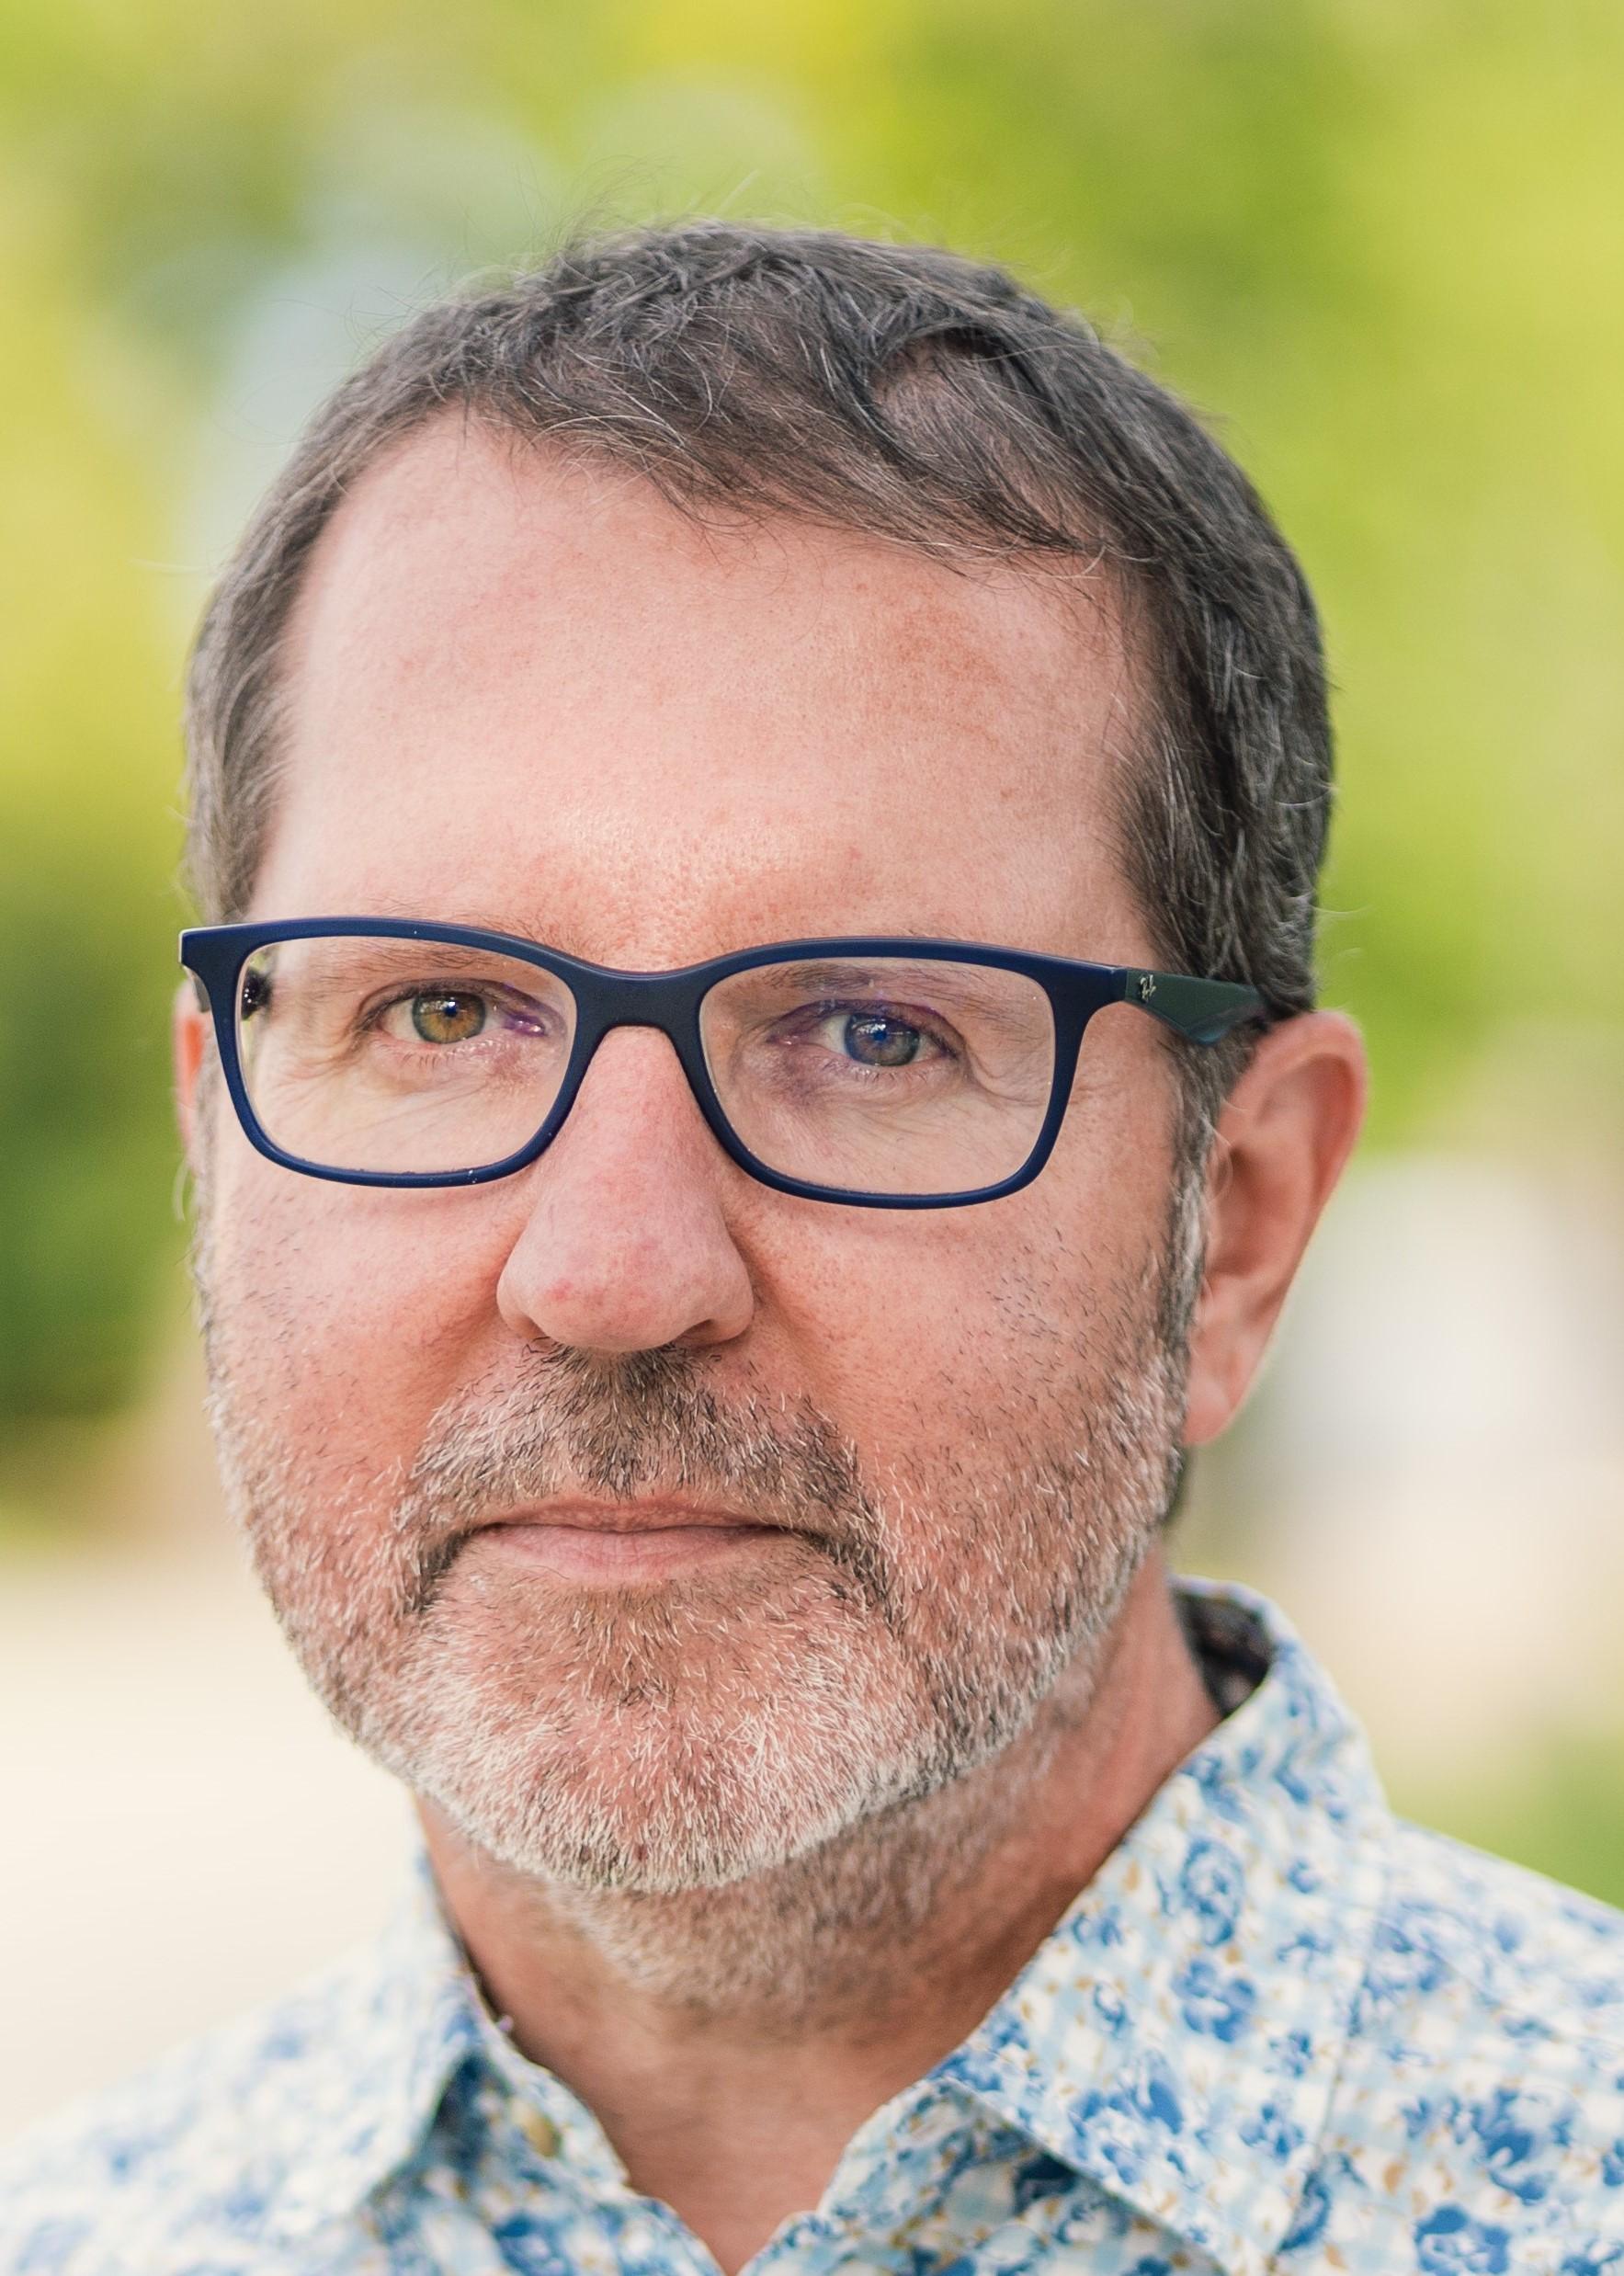 Christian G. Majer